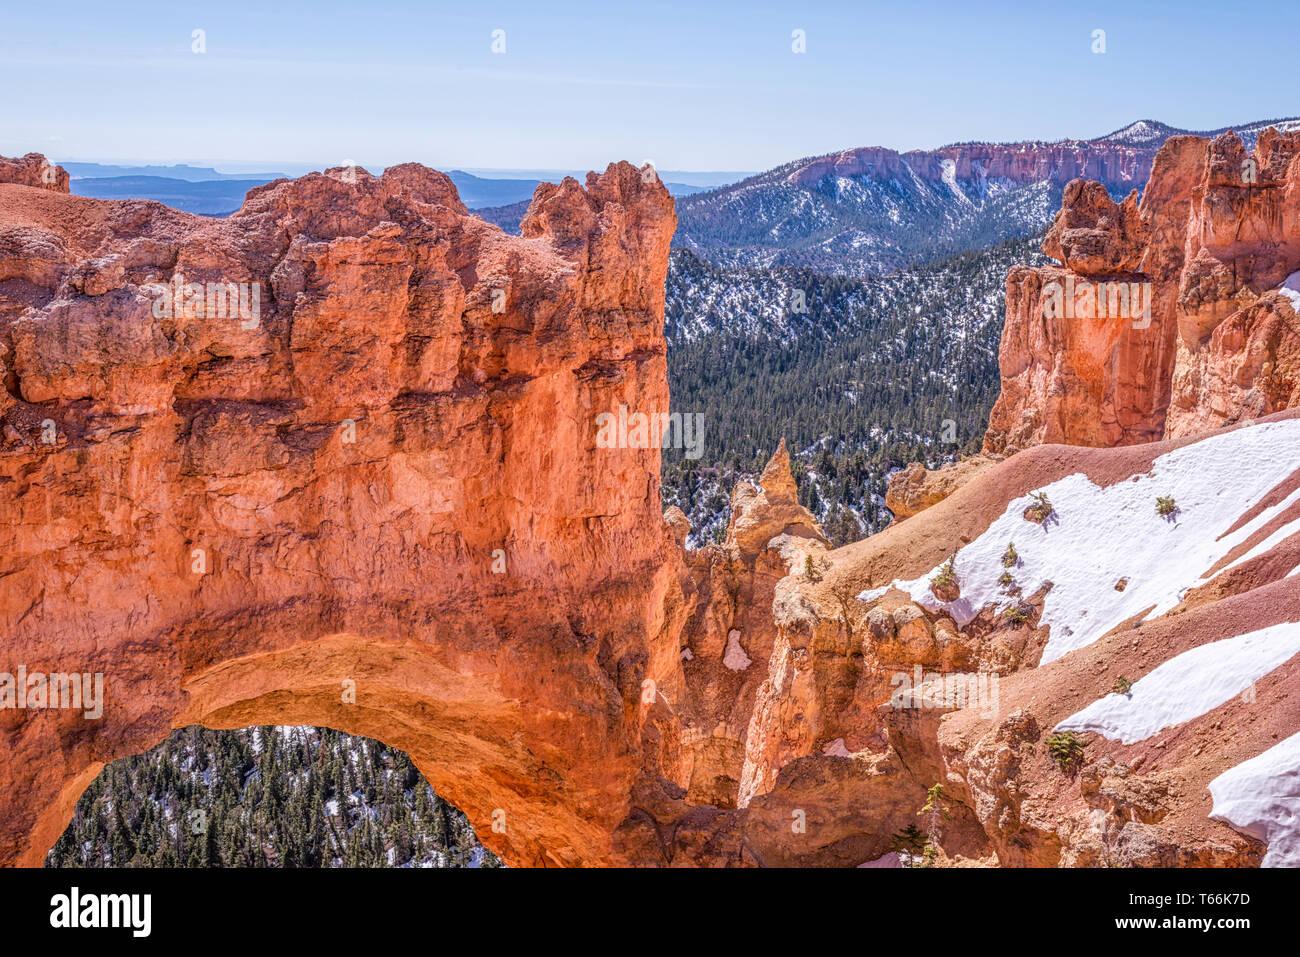 Le pont naturel formation rocheuse. Bryce Canyon National Park, Utah, USA. Banque D'Images